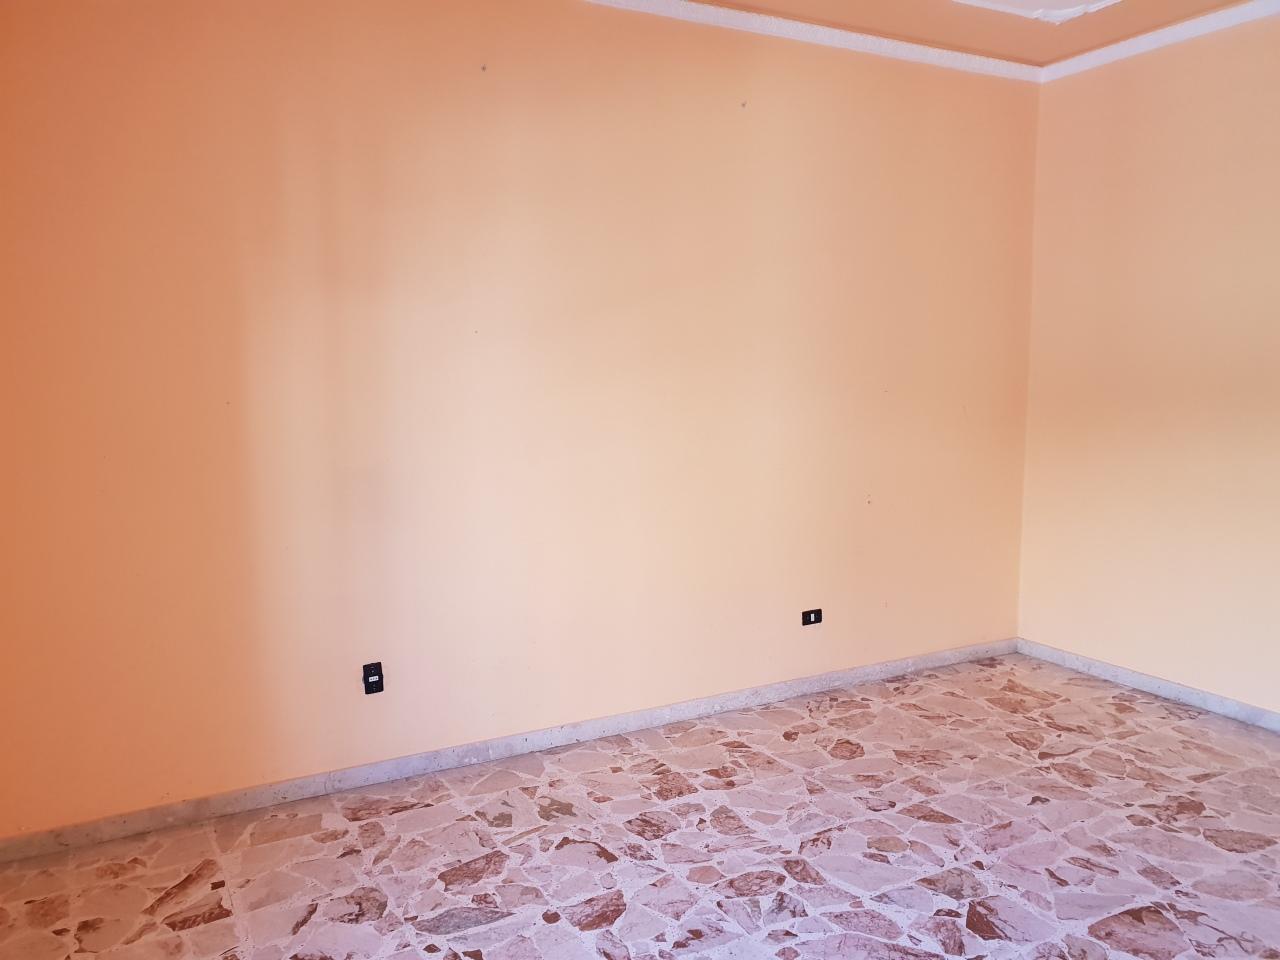 Appartamento - Quadrilocale a Tunisi Grottasanta Servi di Maria, Siracusa